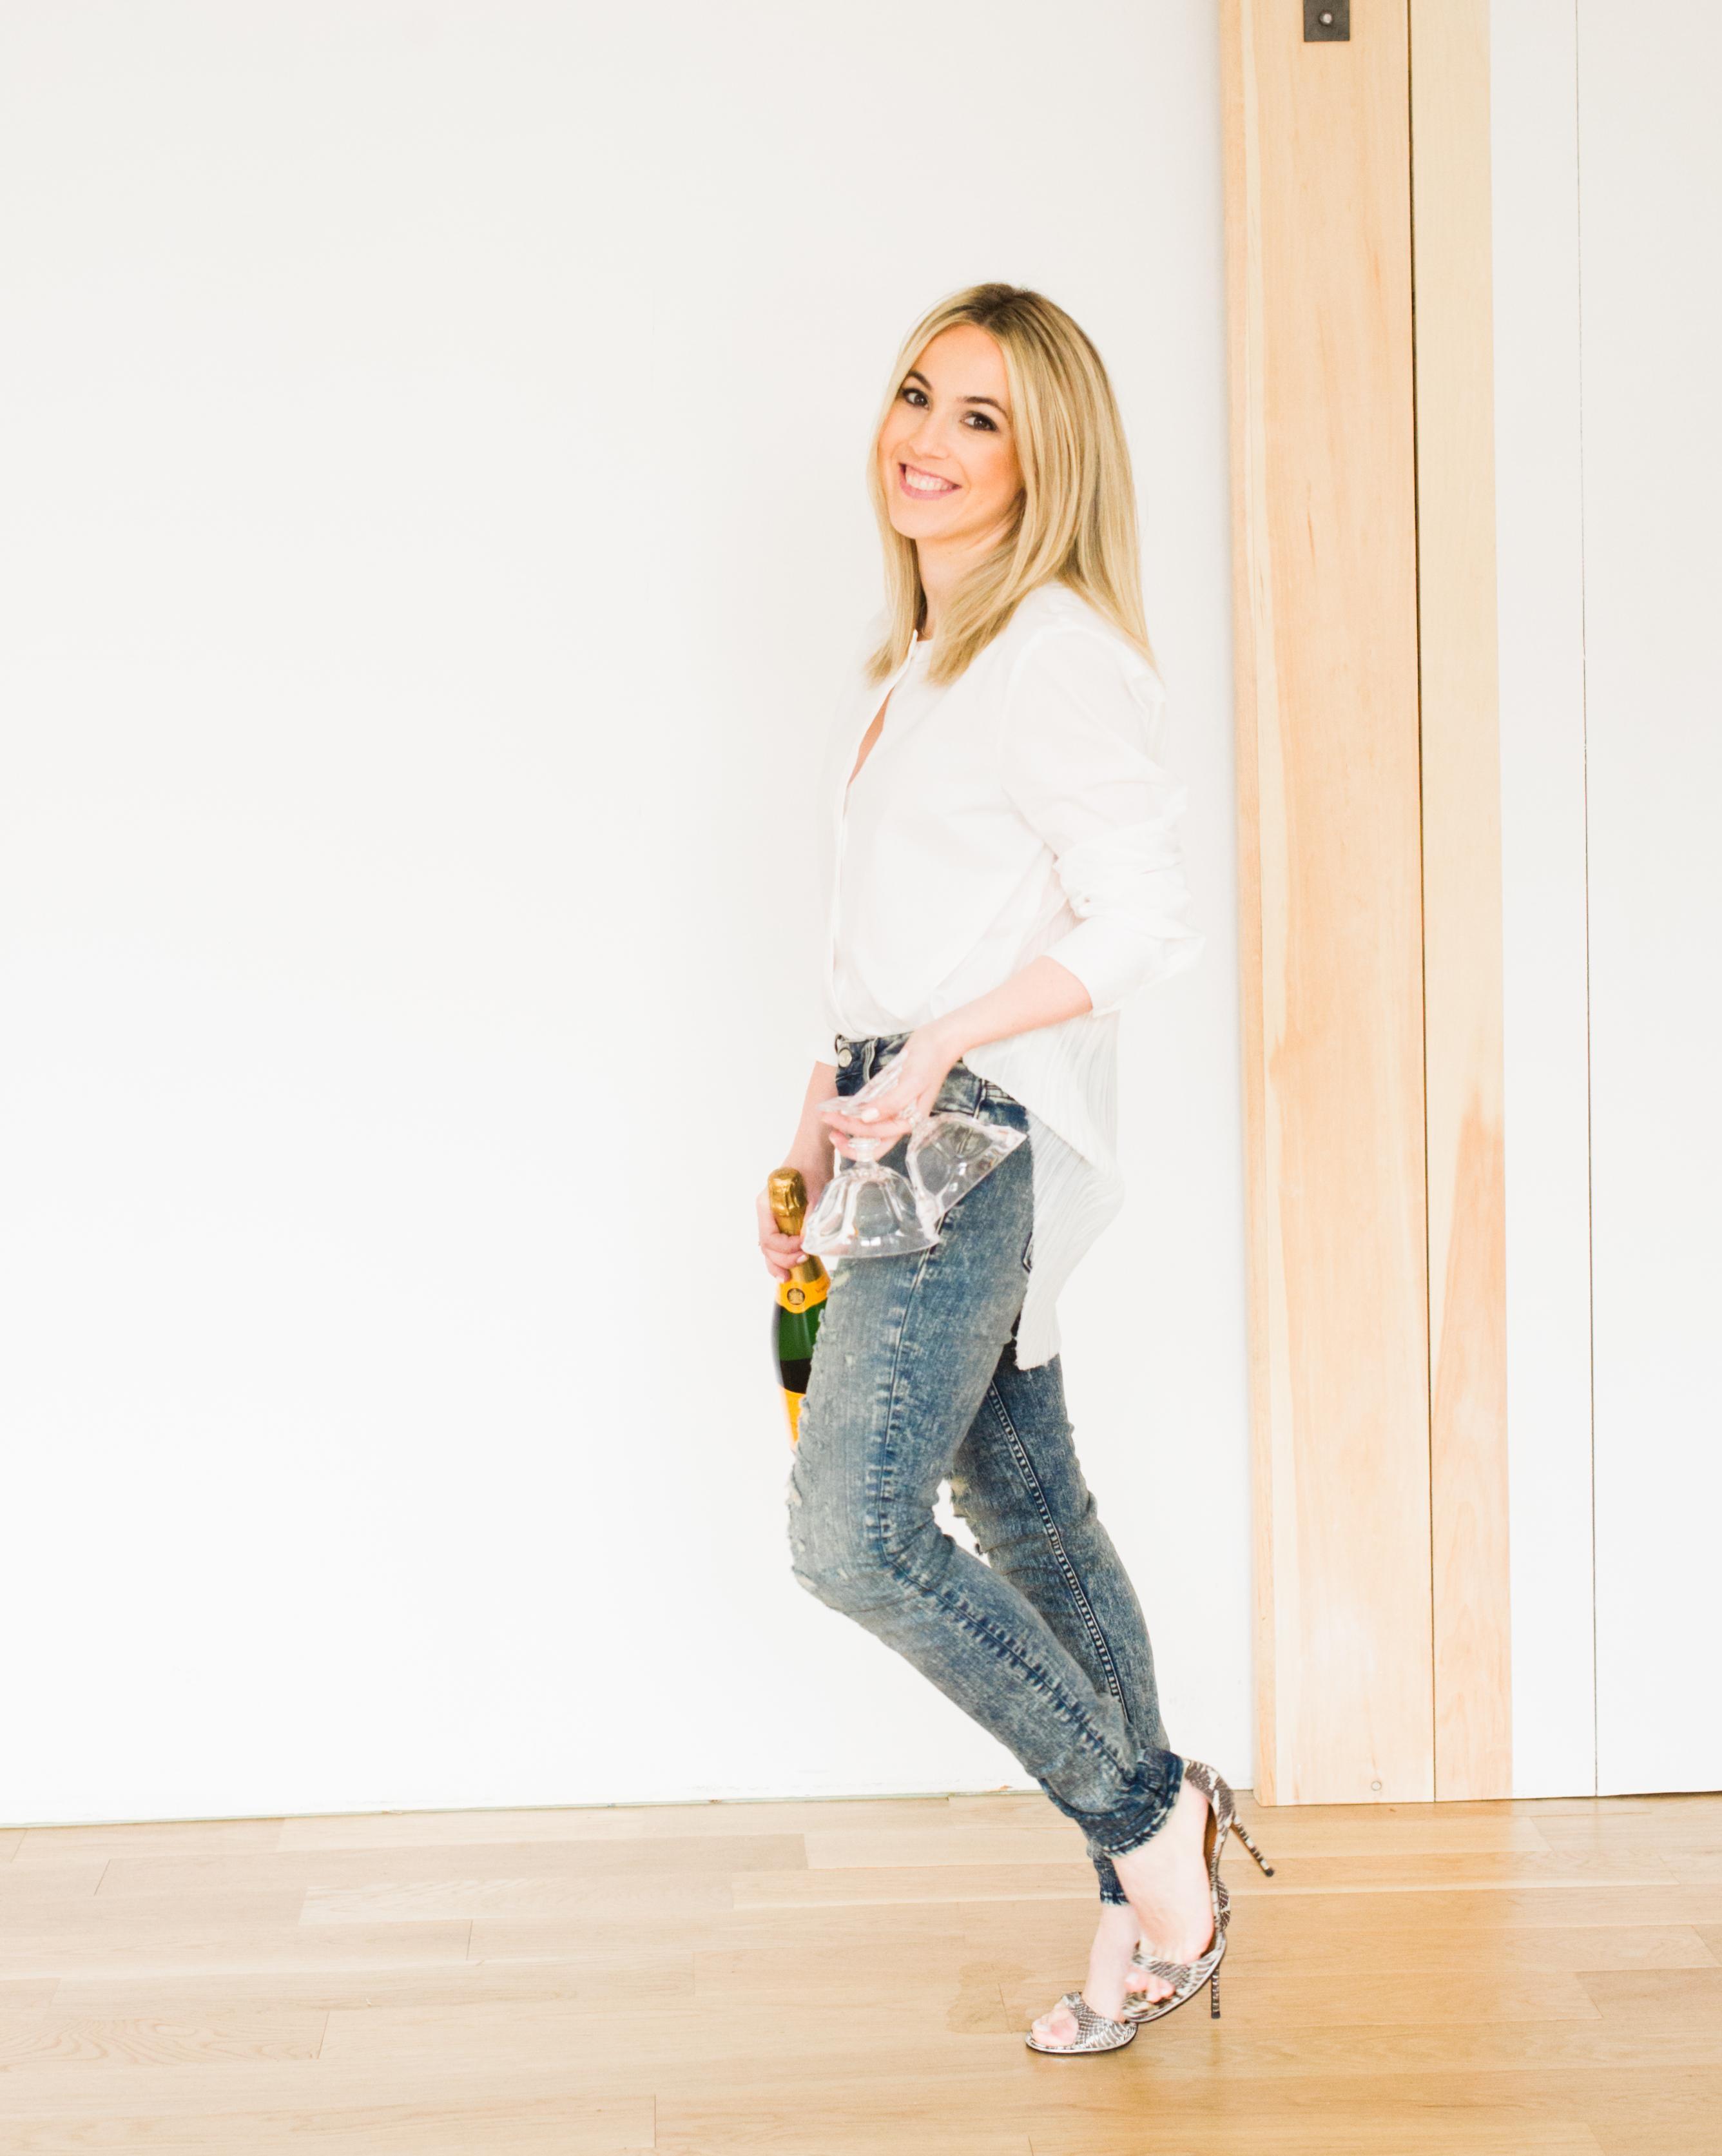 jess levin profile image